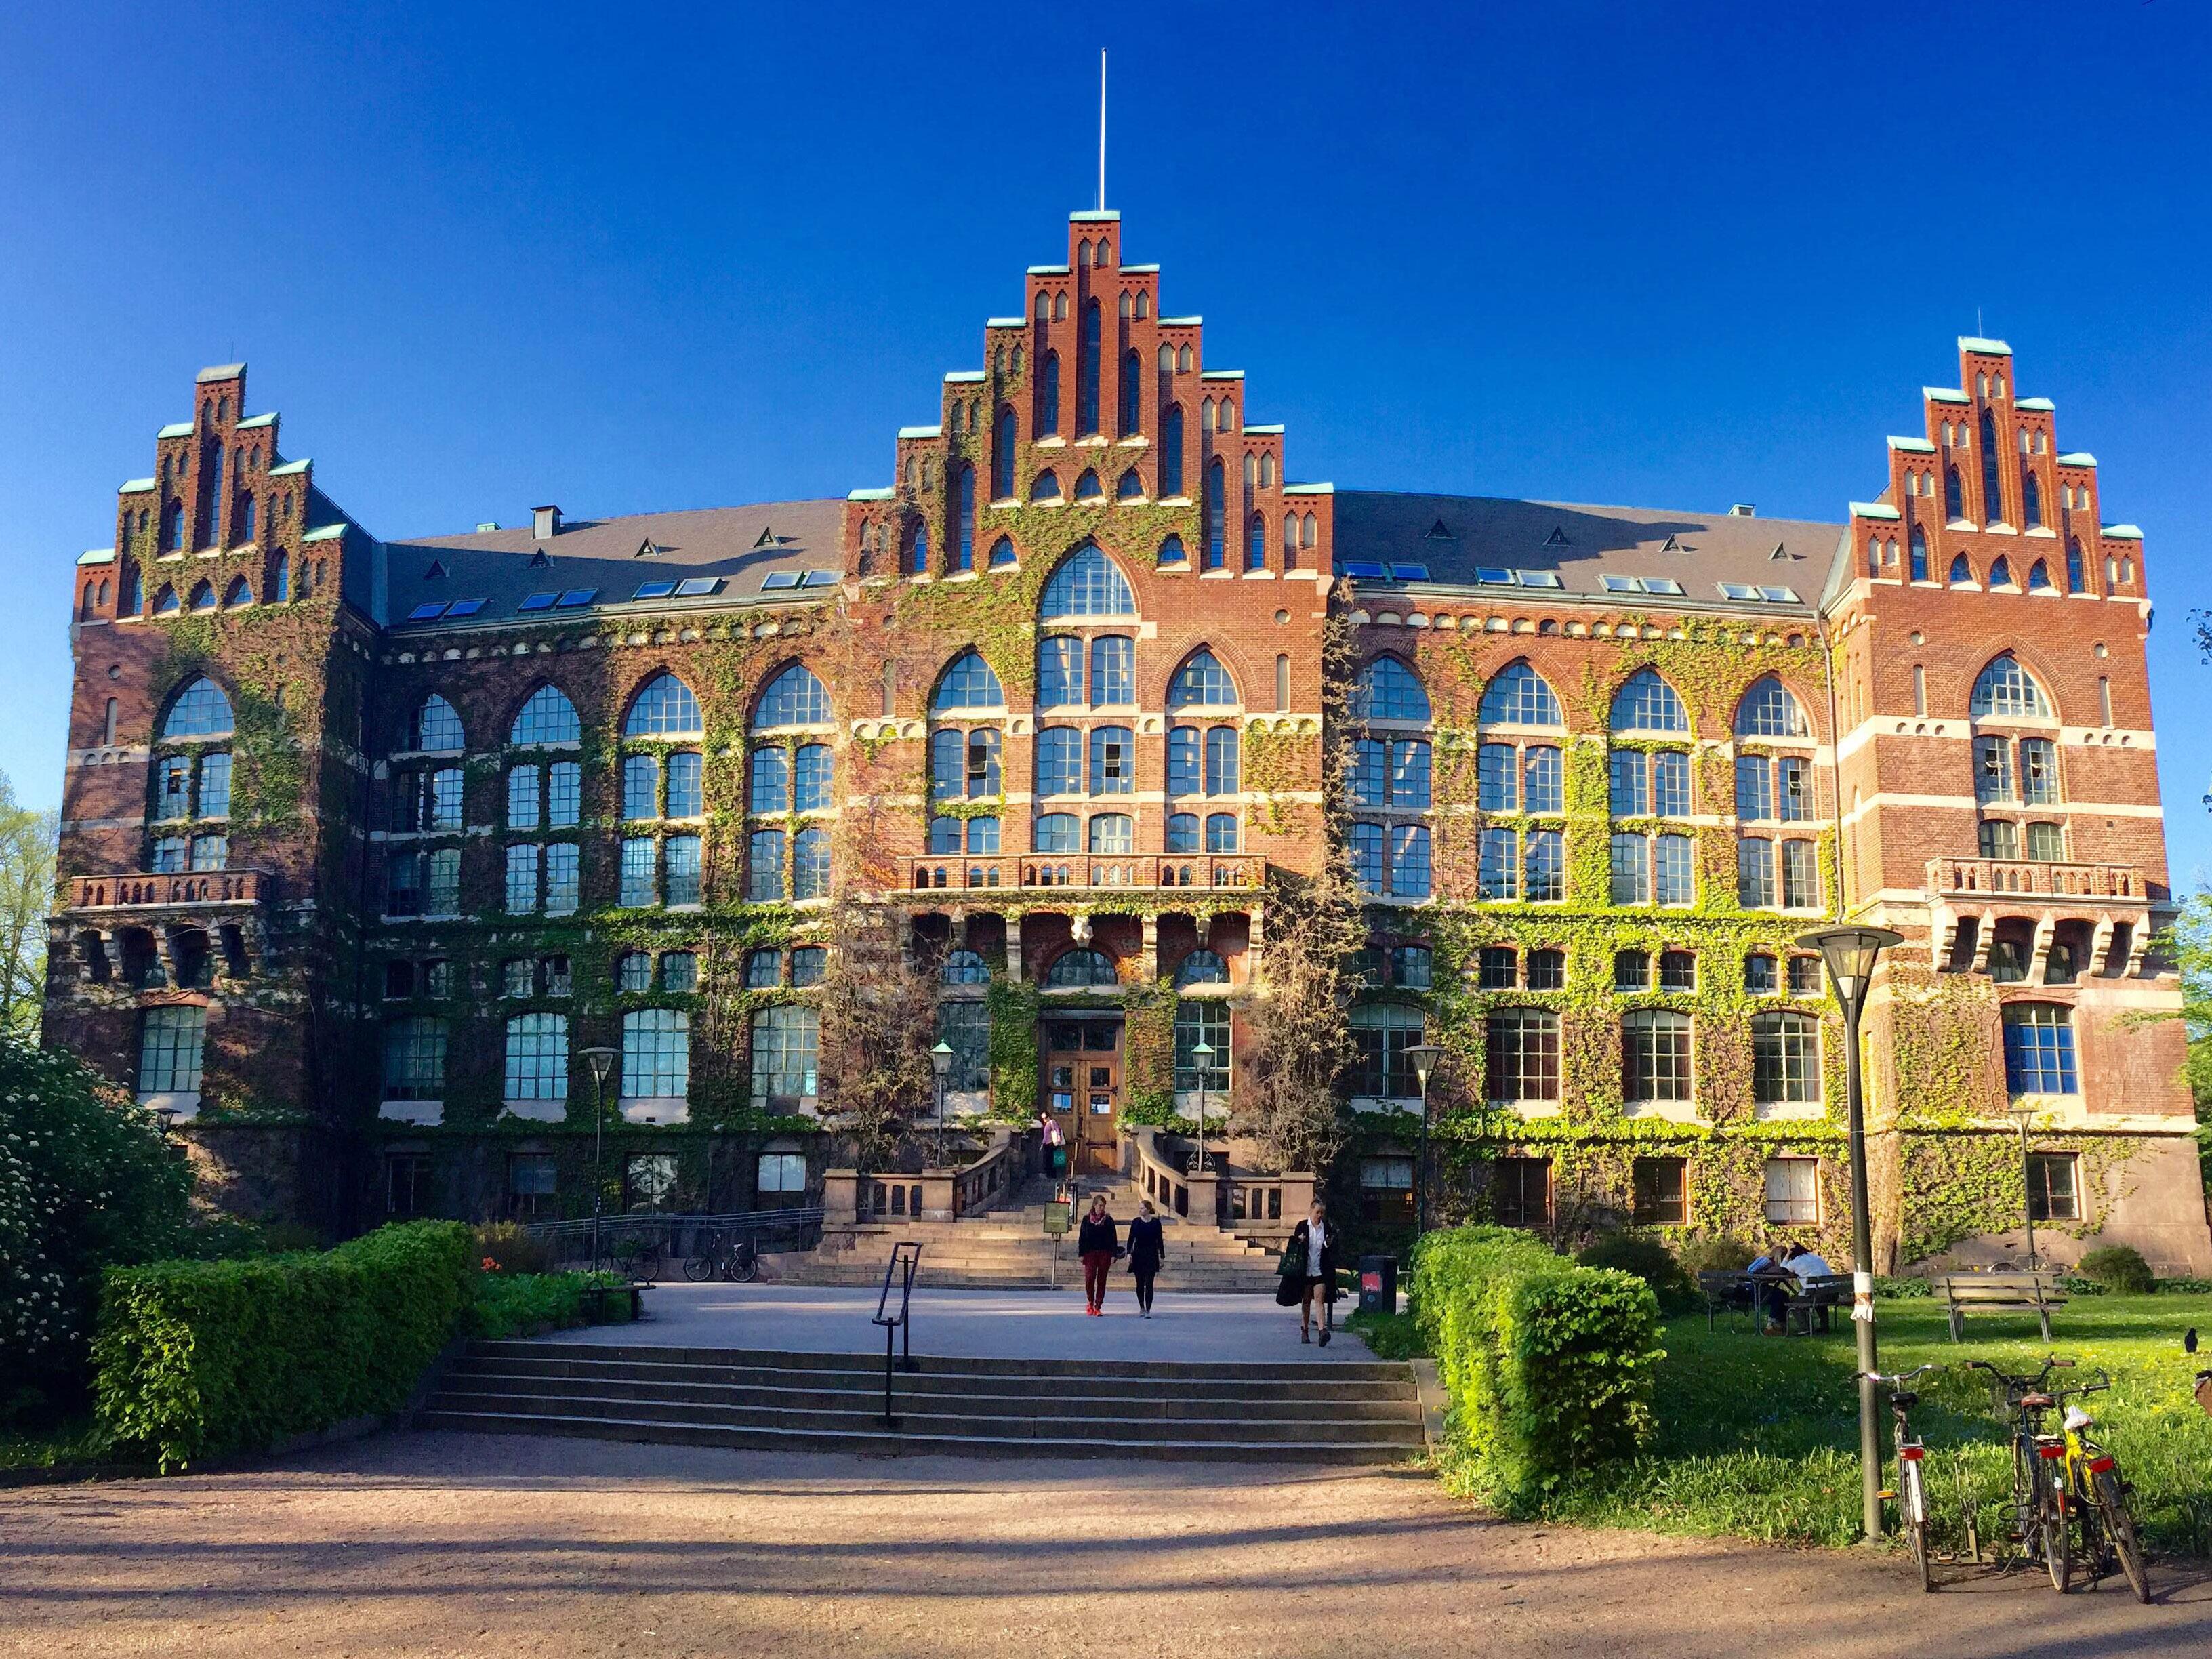 lund-sweden-alison-long-travel-guide7